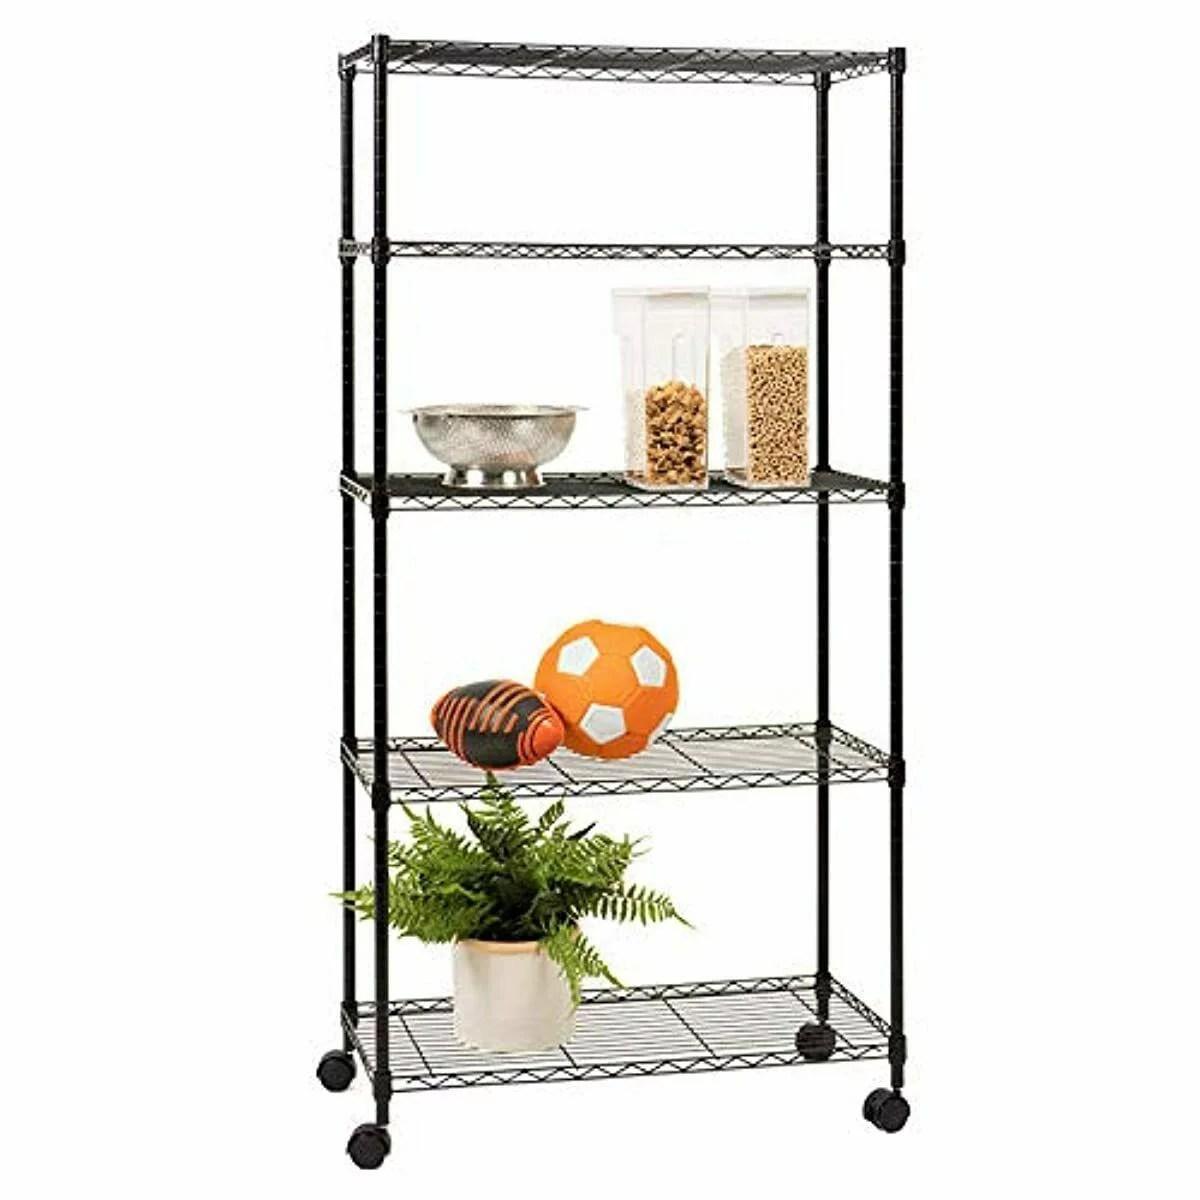 5 shelf metal storage rack heavy duty height adjustable metal storage shelves for home metal storage shelving rack w wheel wire shelving unit for